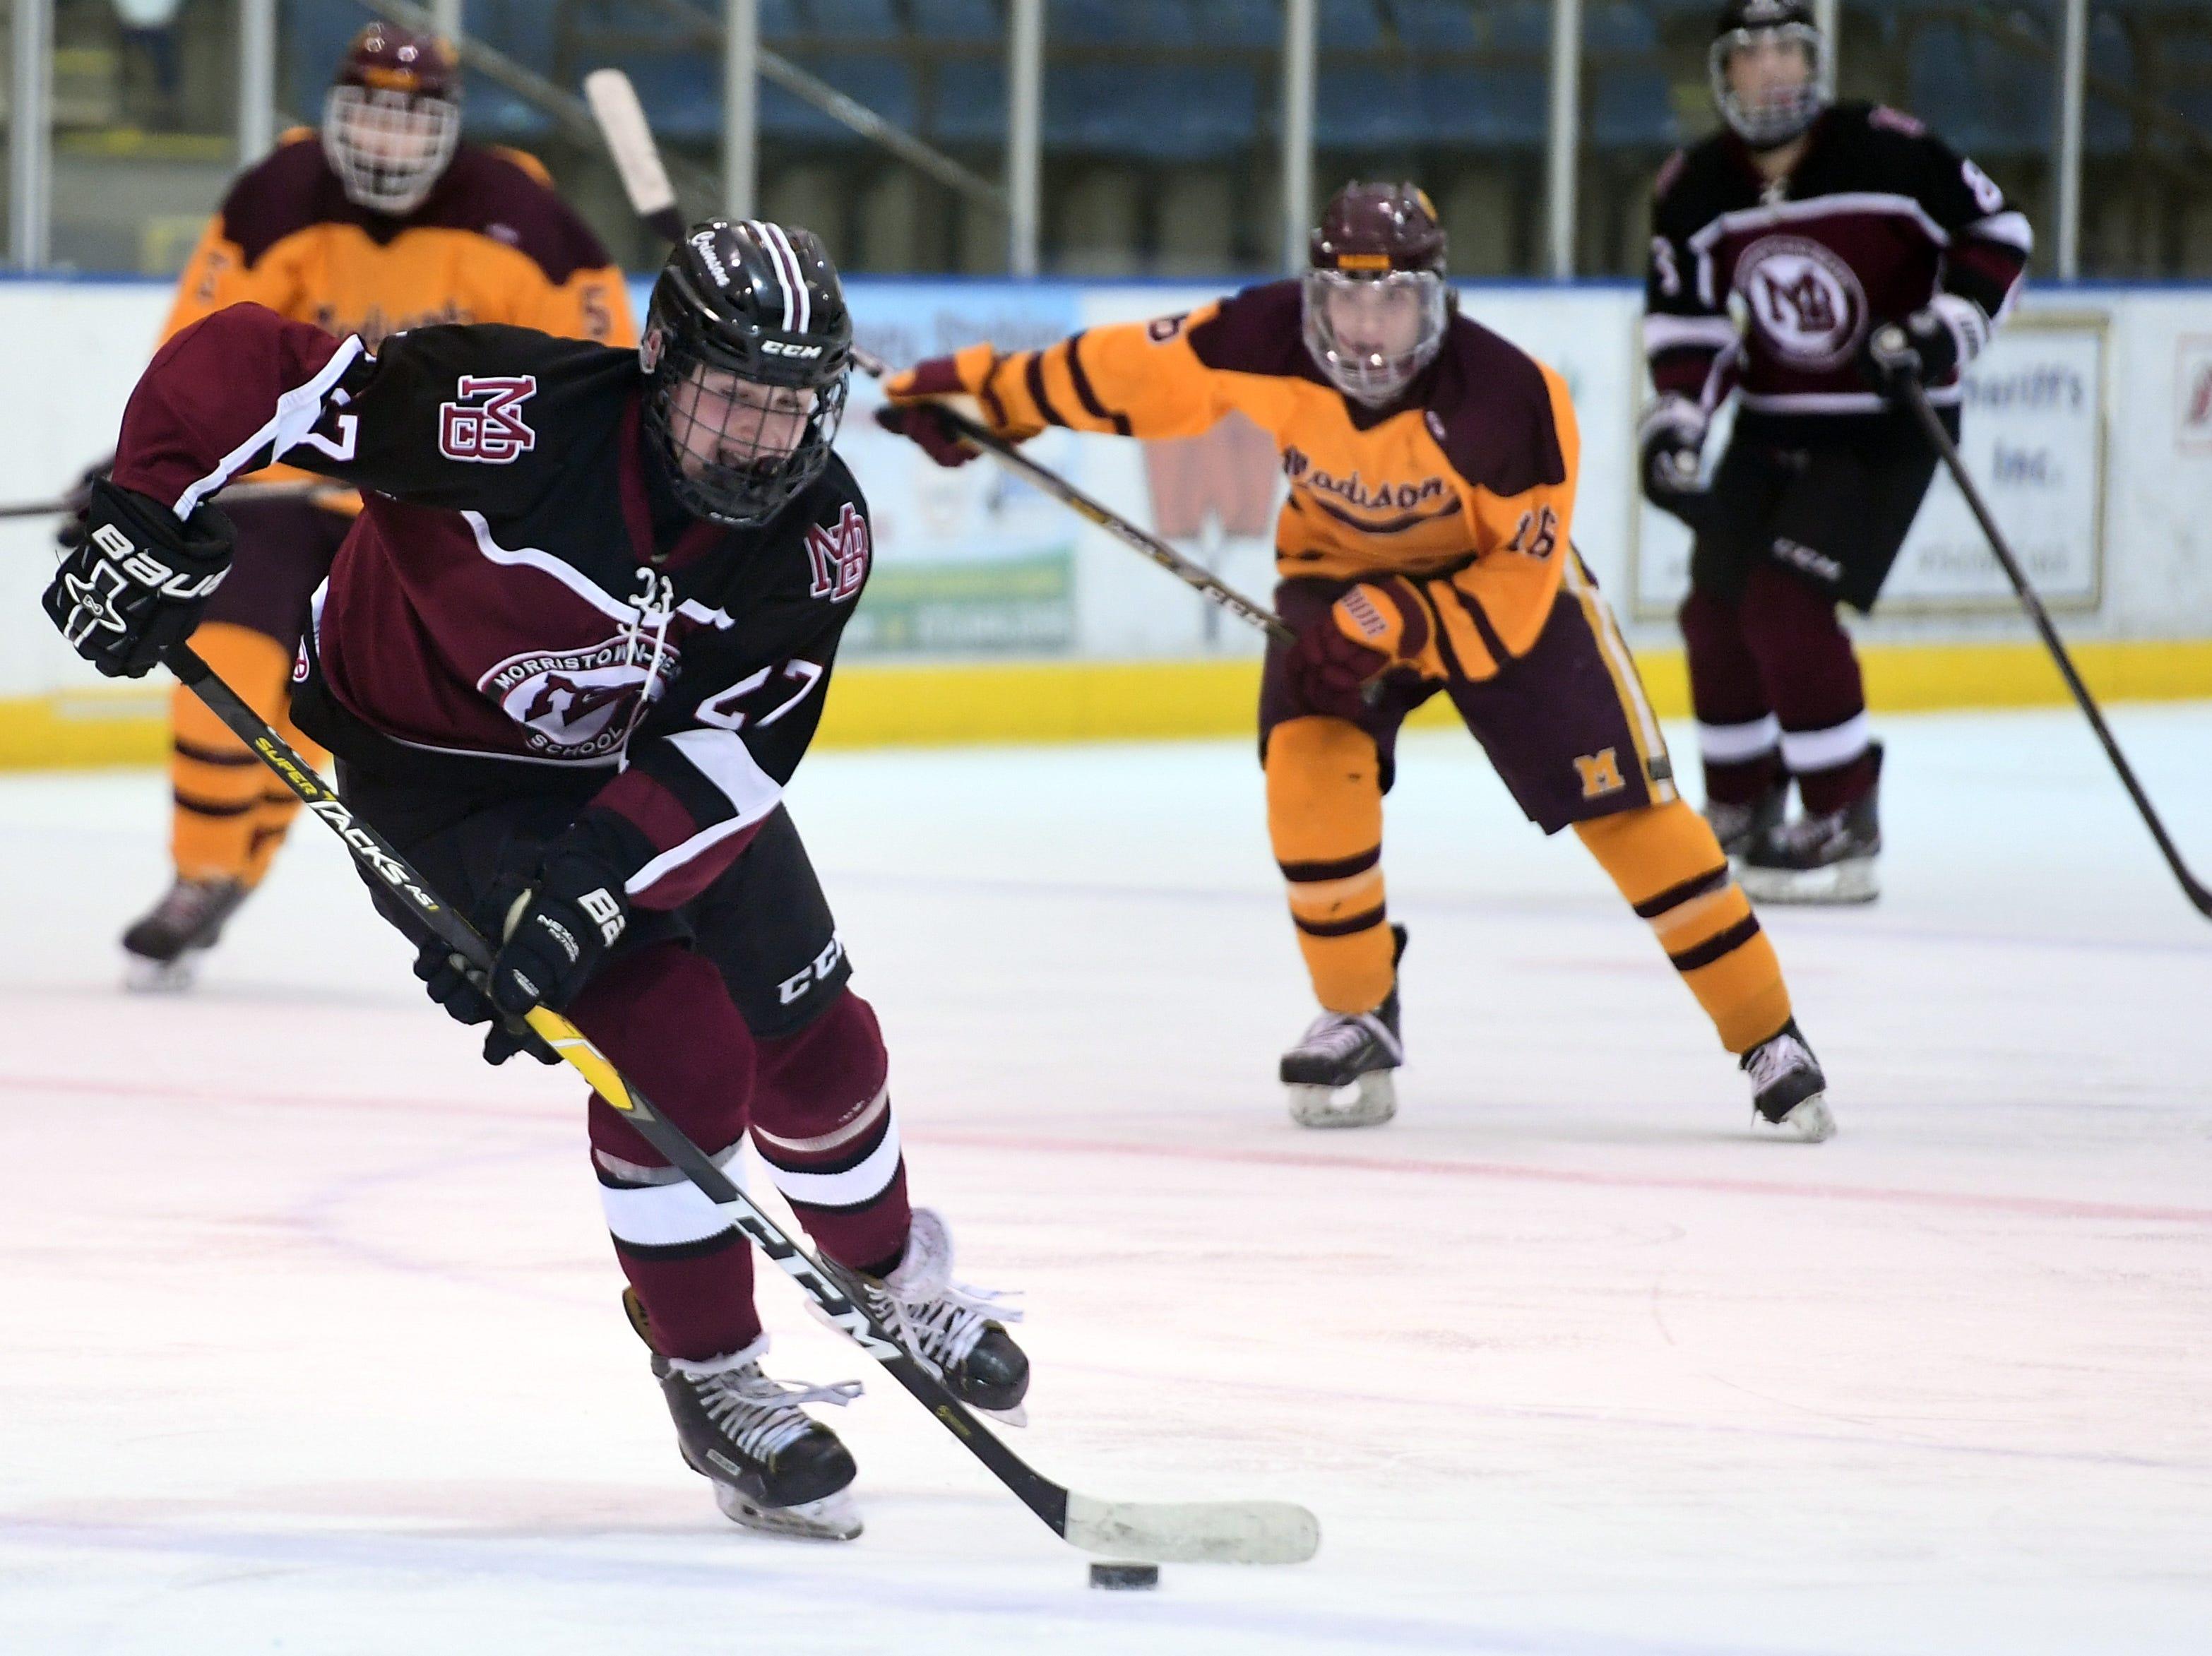 Madison ice hockey vs. Morristown-Beard at Mennen Sports Arena on Thursday, December 20, 2018. Morristown-Beard #27 Seth Kaplan.